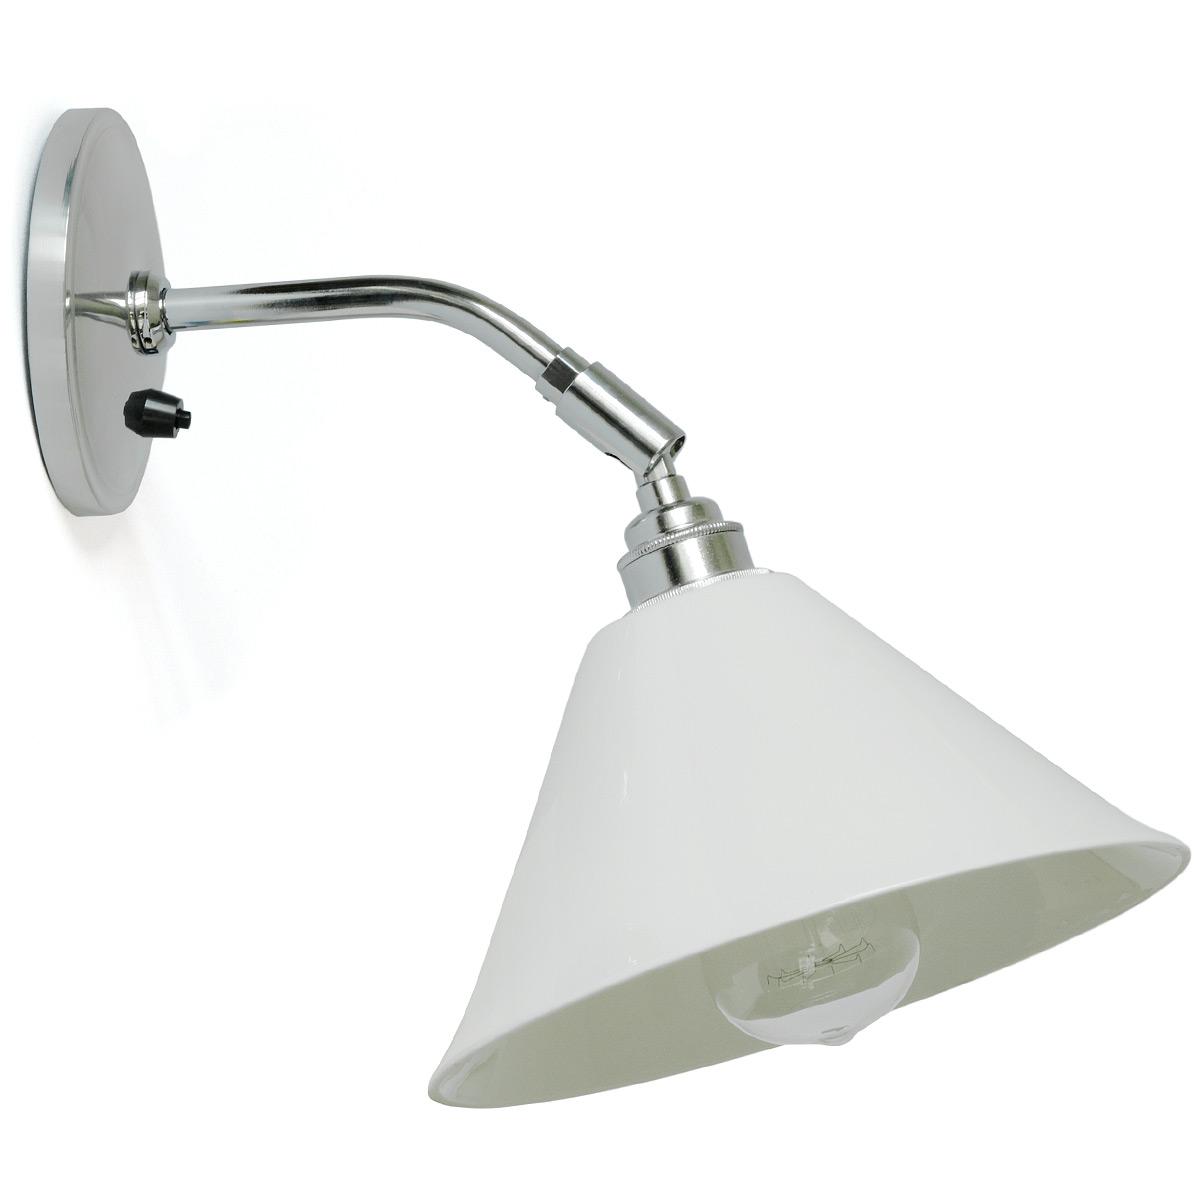 kleine keramik wandlampe mit gelenkarm task casa lumi. Black Bedroom Furniture Sets. Home Design Ideas